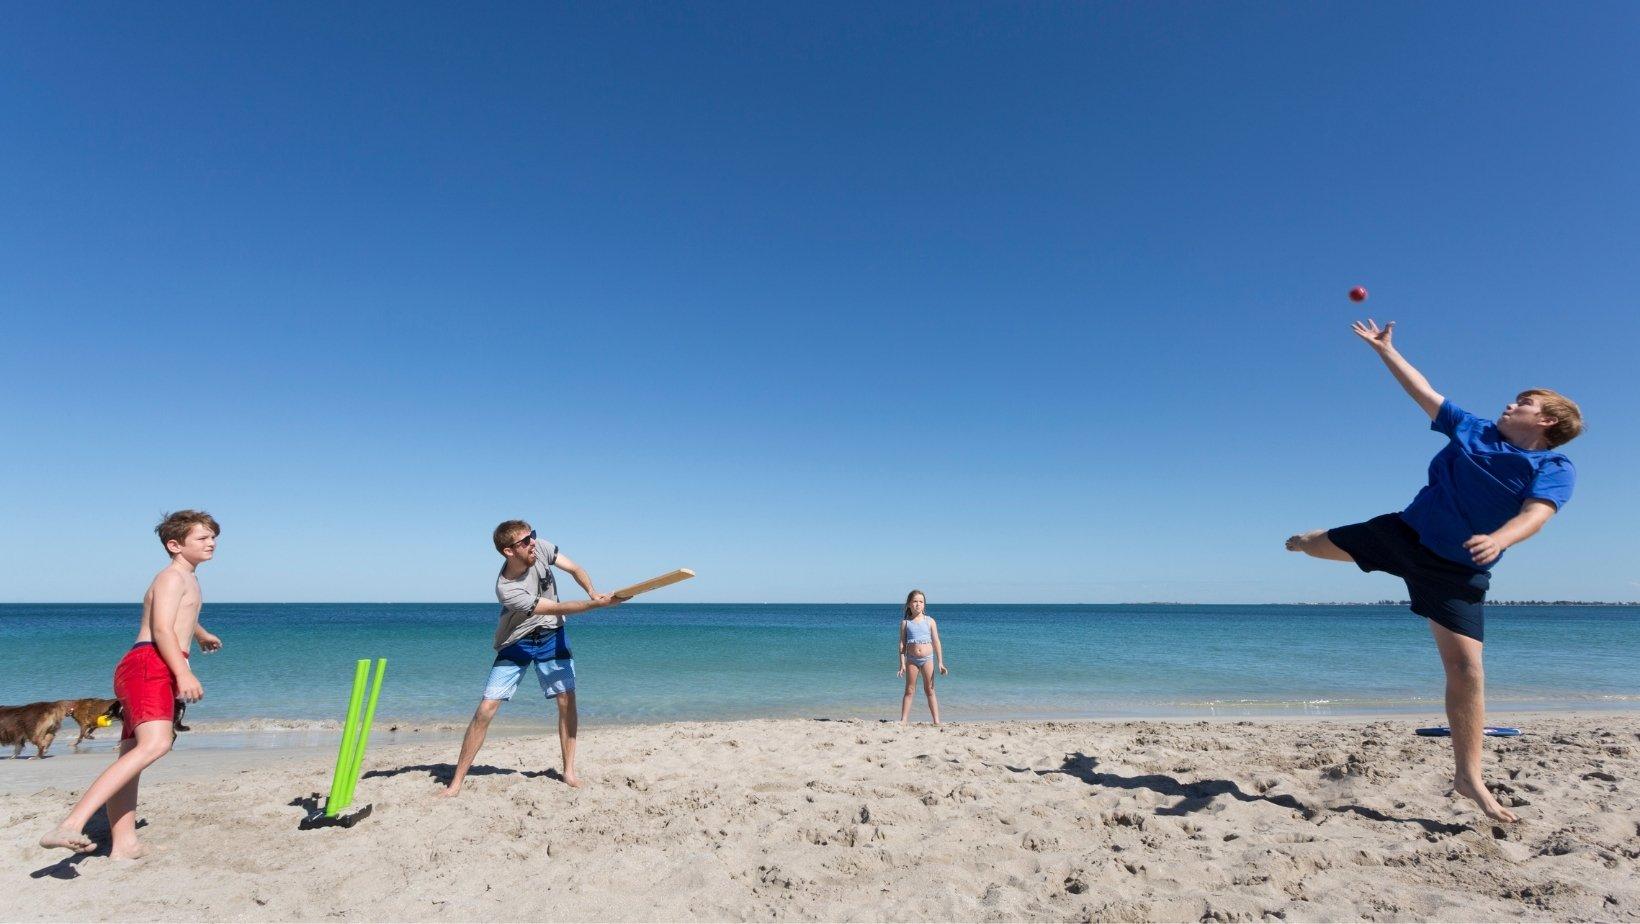 Backyard cricket on the beach, New South Wales, Australia